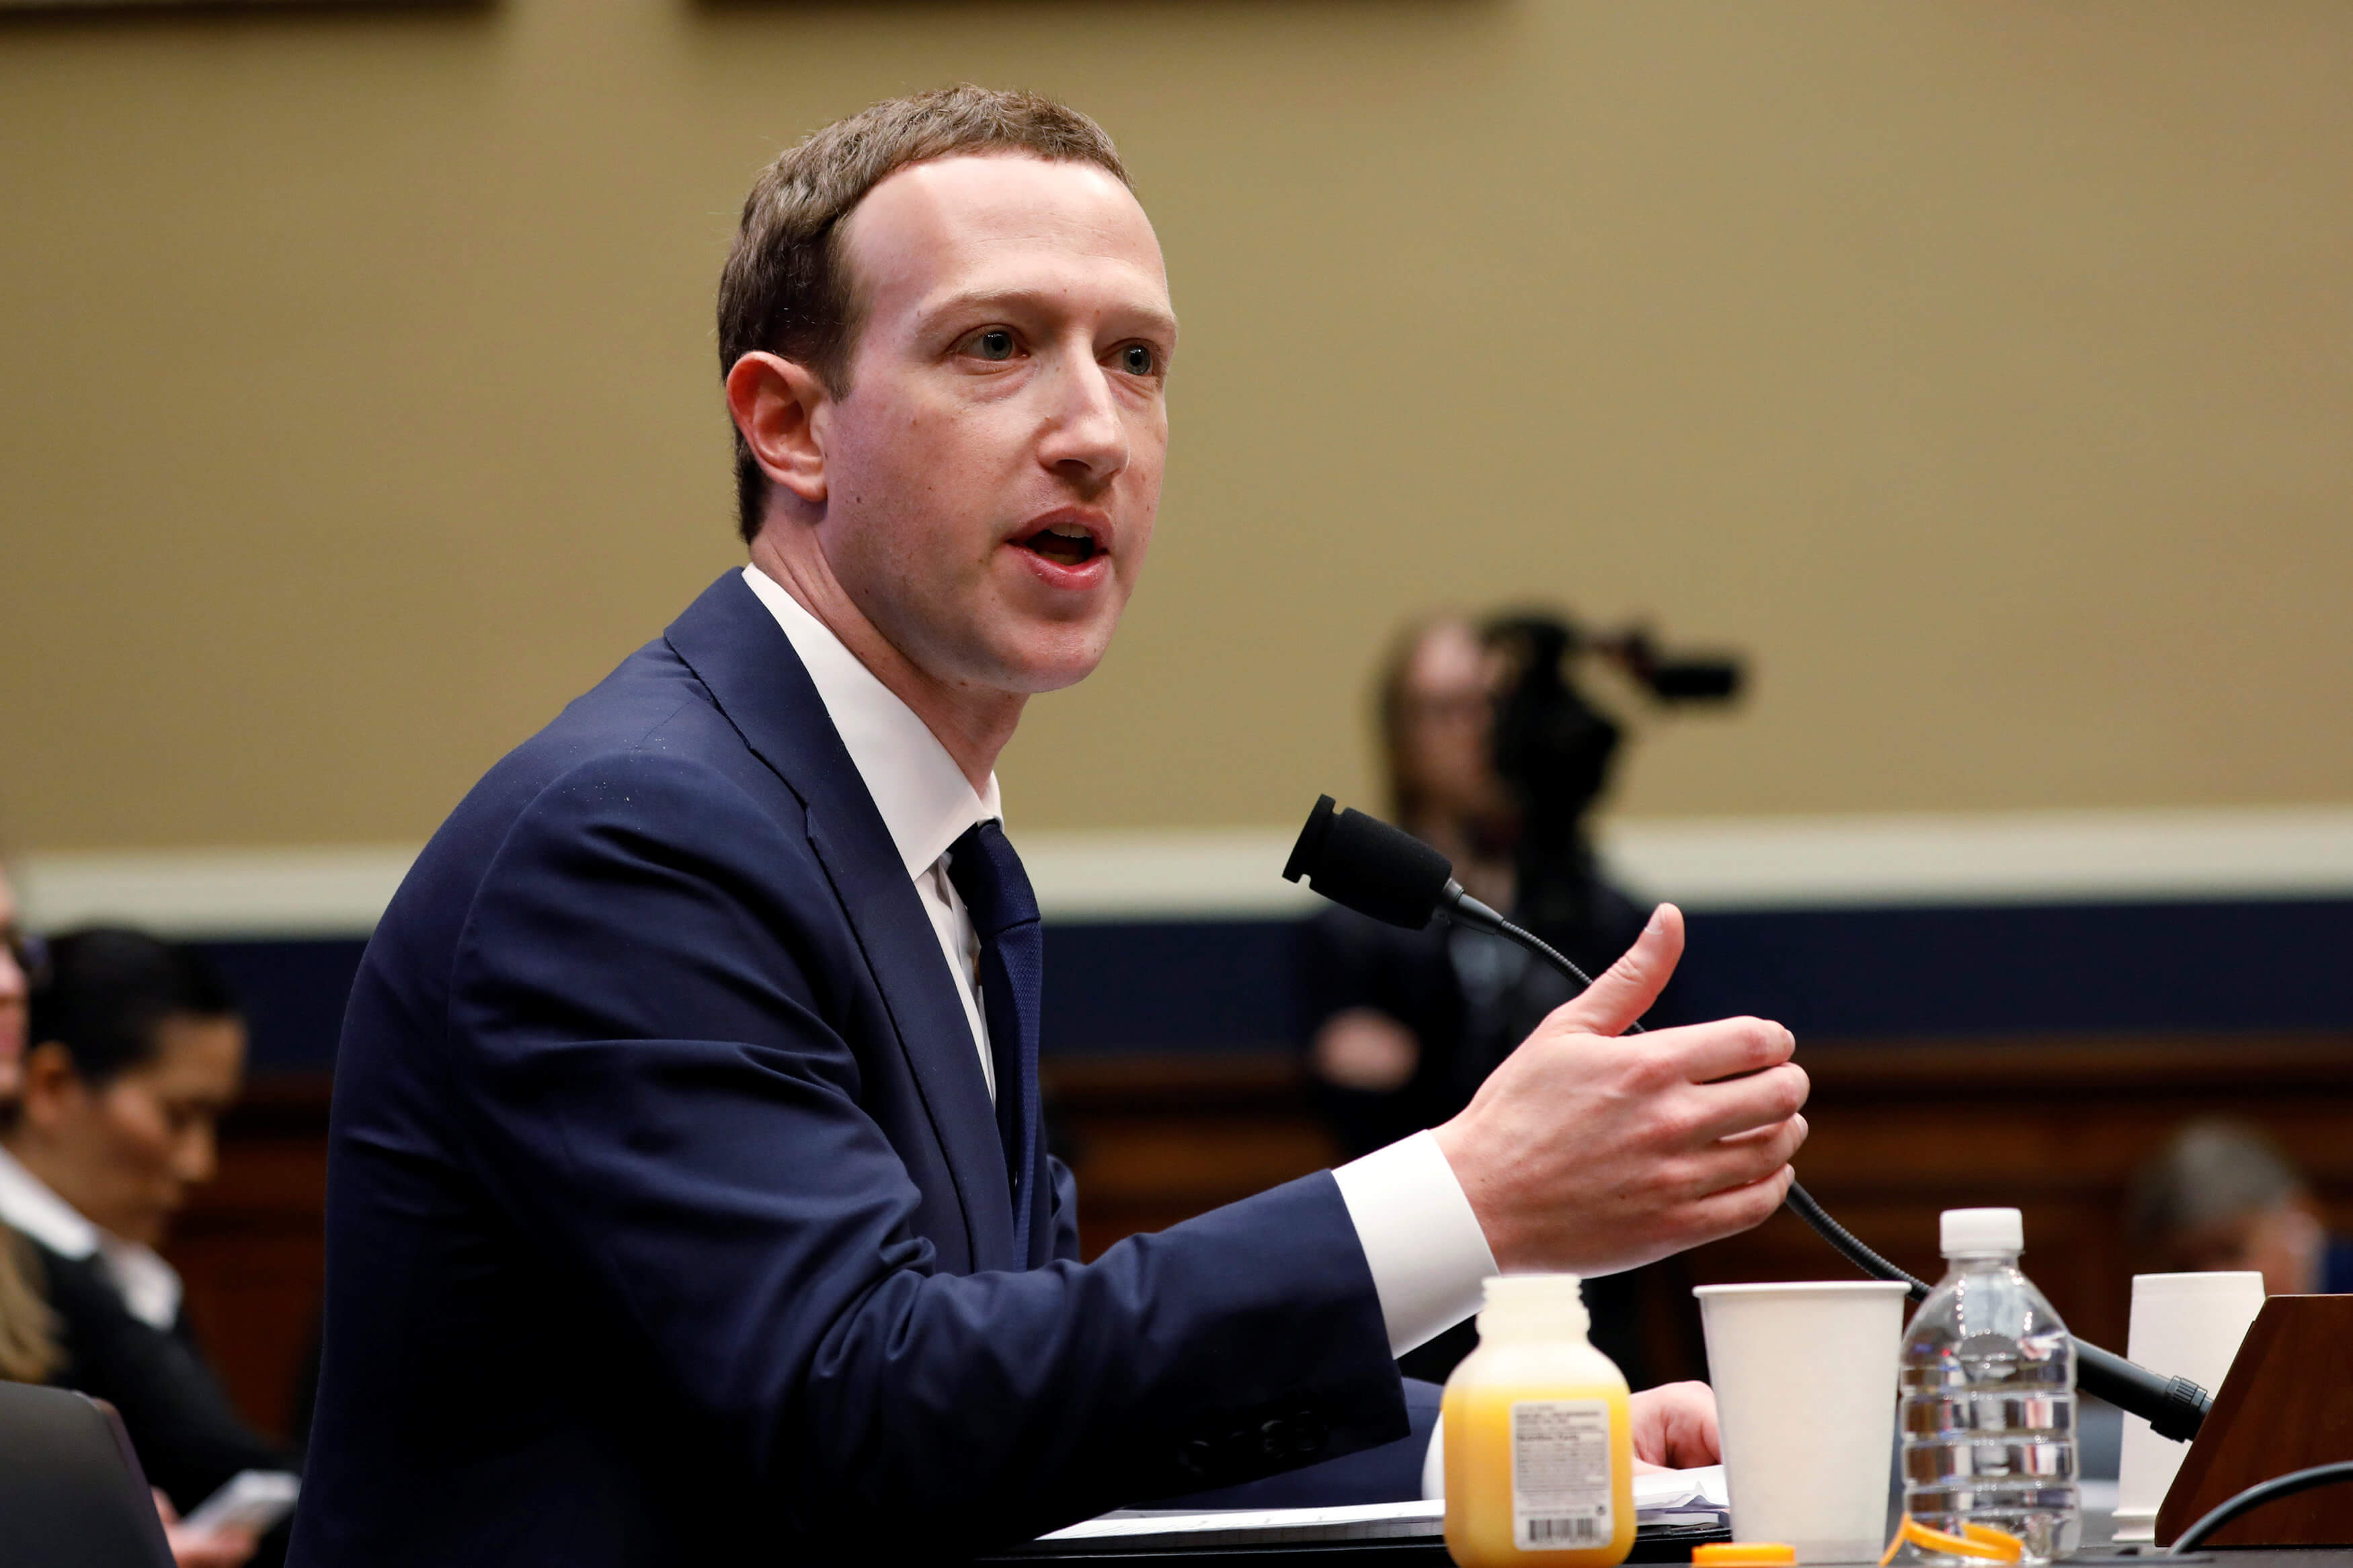 Facebook: Συνελήφθη για σεξισμό και ρατσισμό ο υπεύθυνος ασφαλείας του Ζάκερμπεργκ